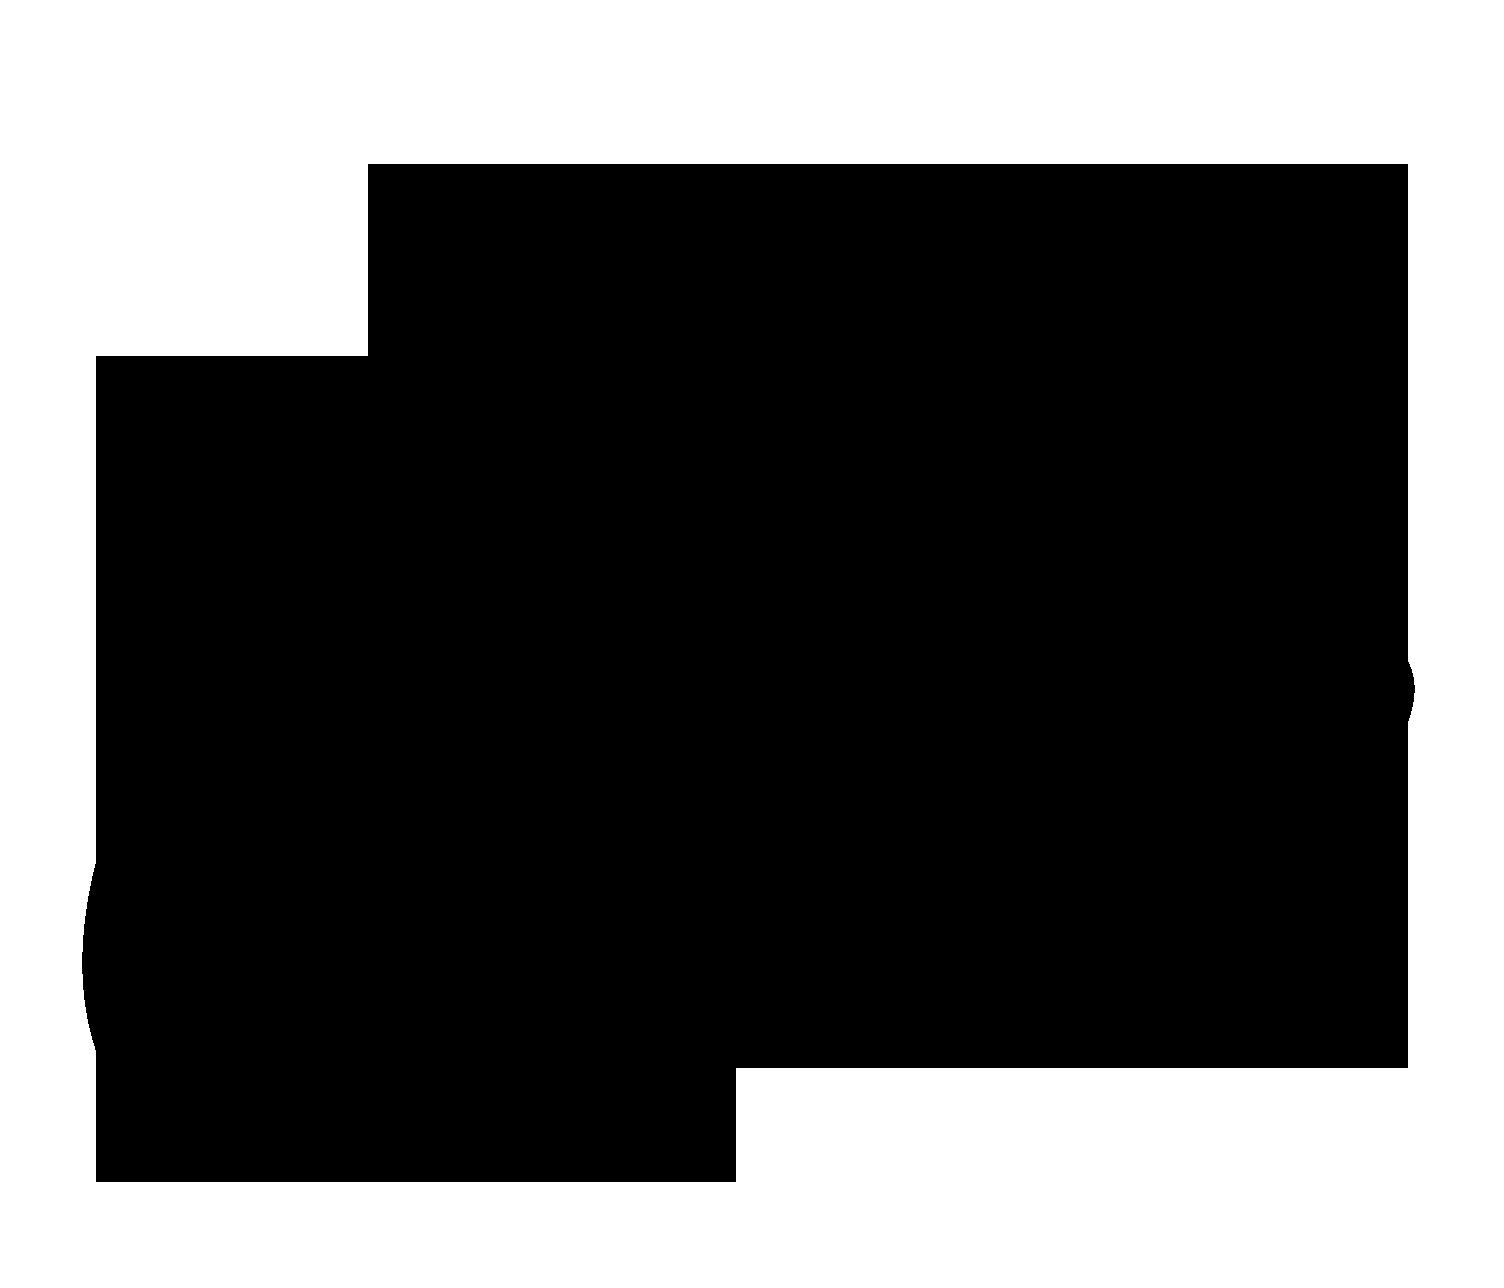 gulla-jonsdottir-press-logo-palace-costes.png